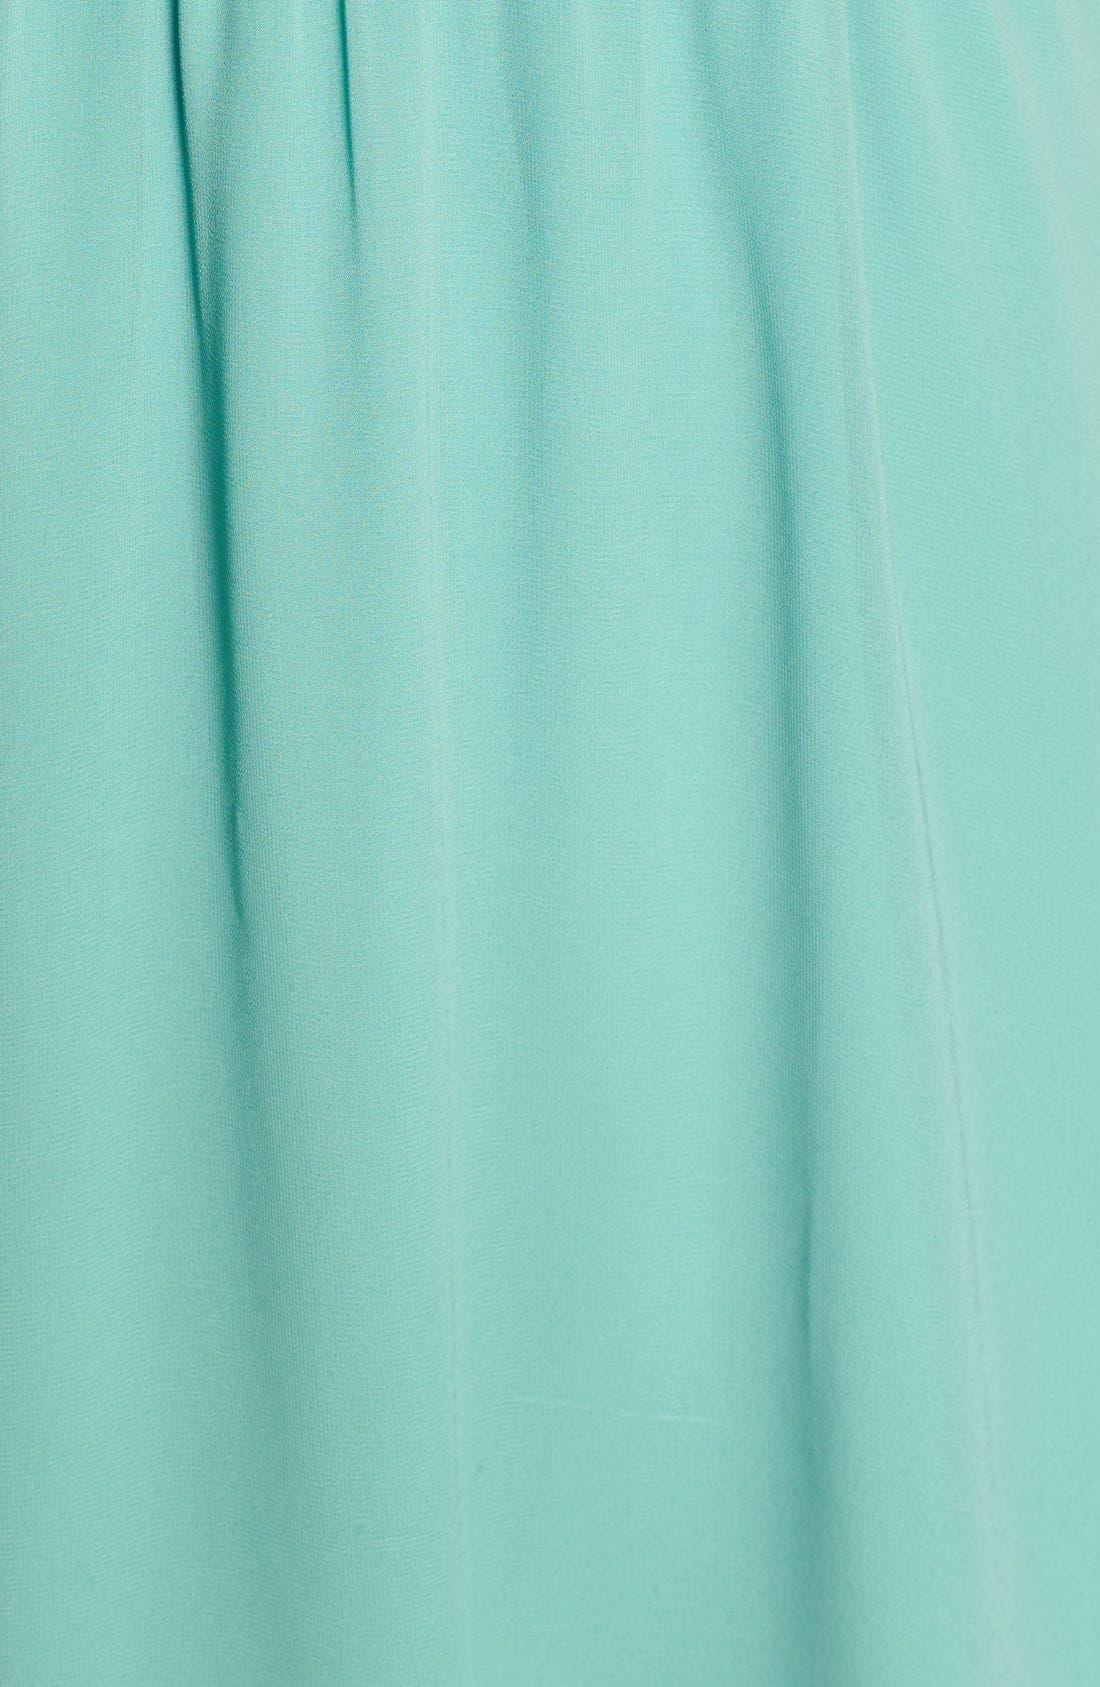 Blouson Chiffon Skater Dress,                             Alternate thumbnail 214, color,